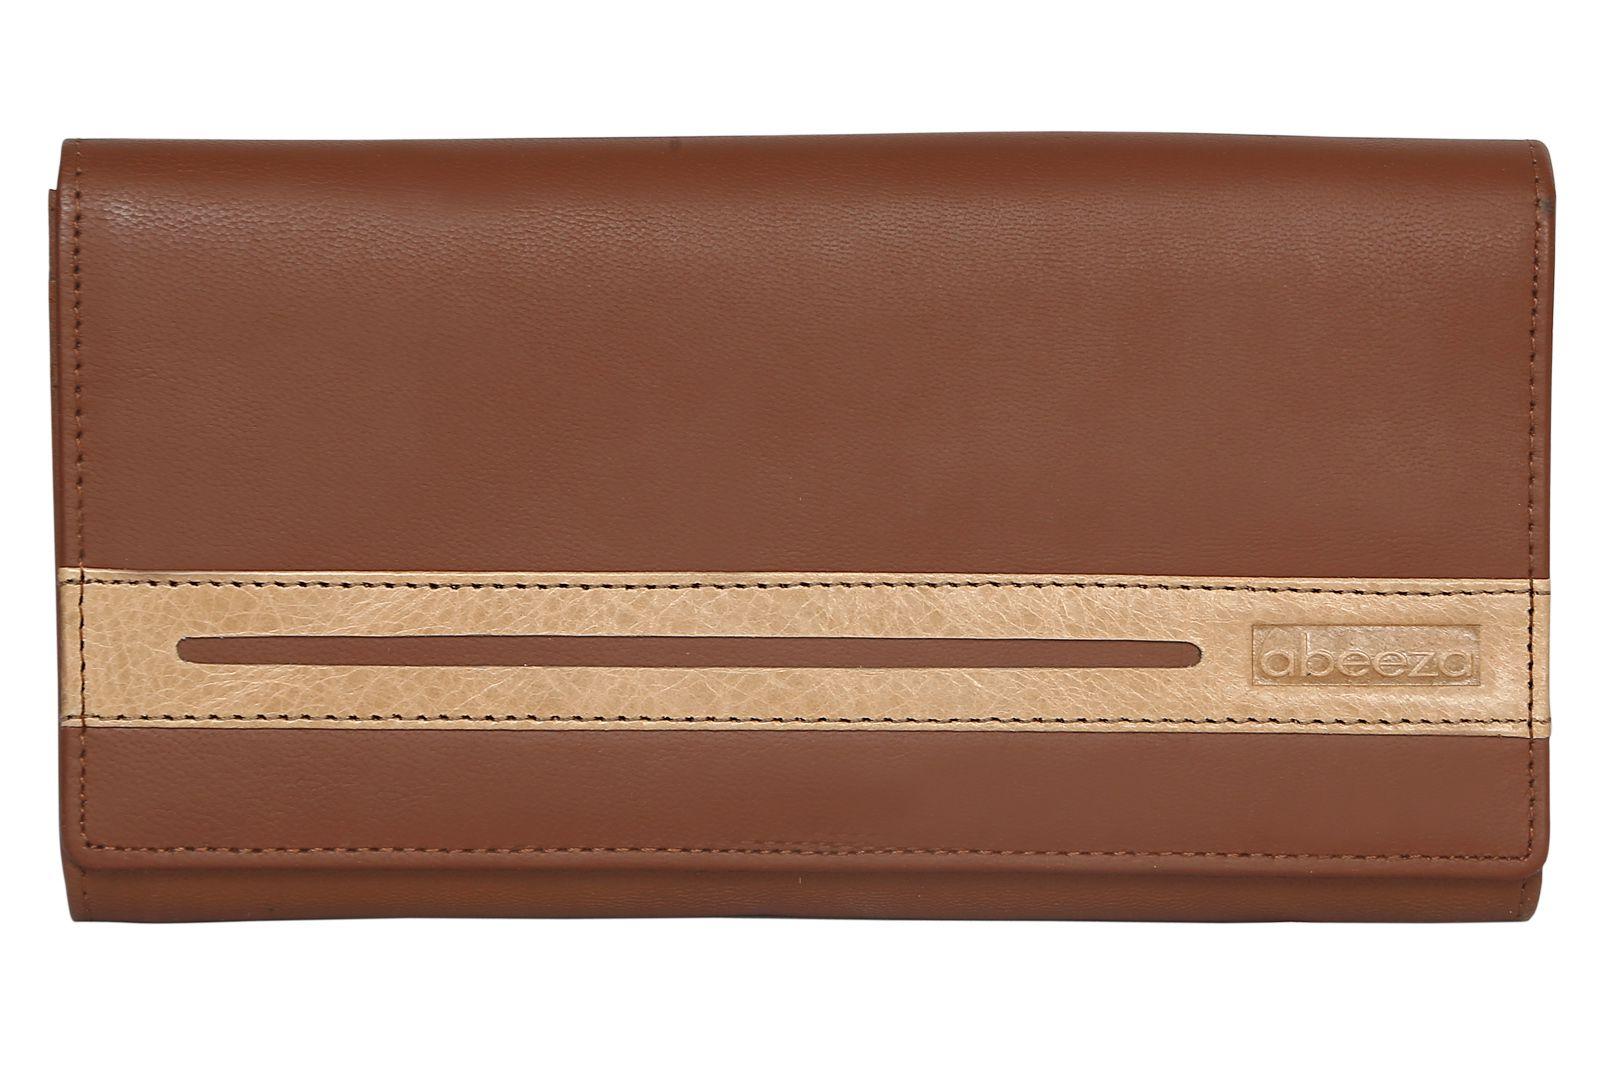 Abeeza Brown Wallet